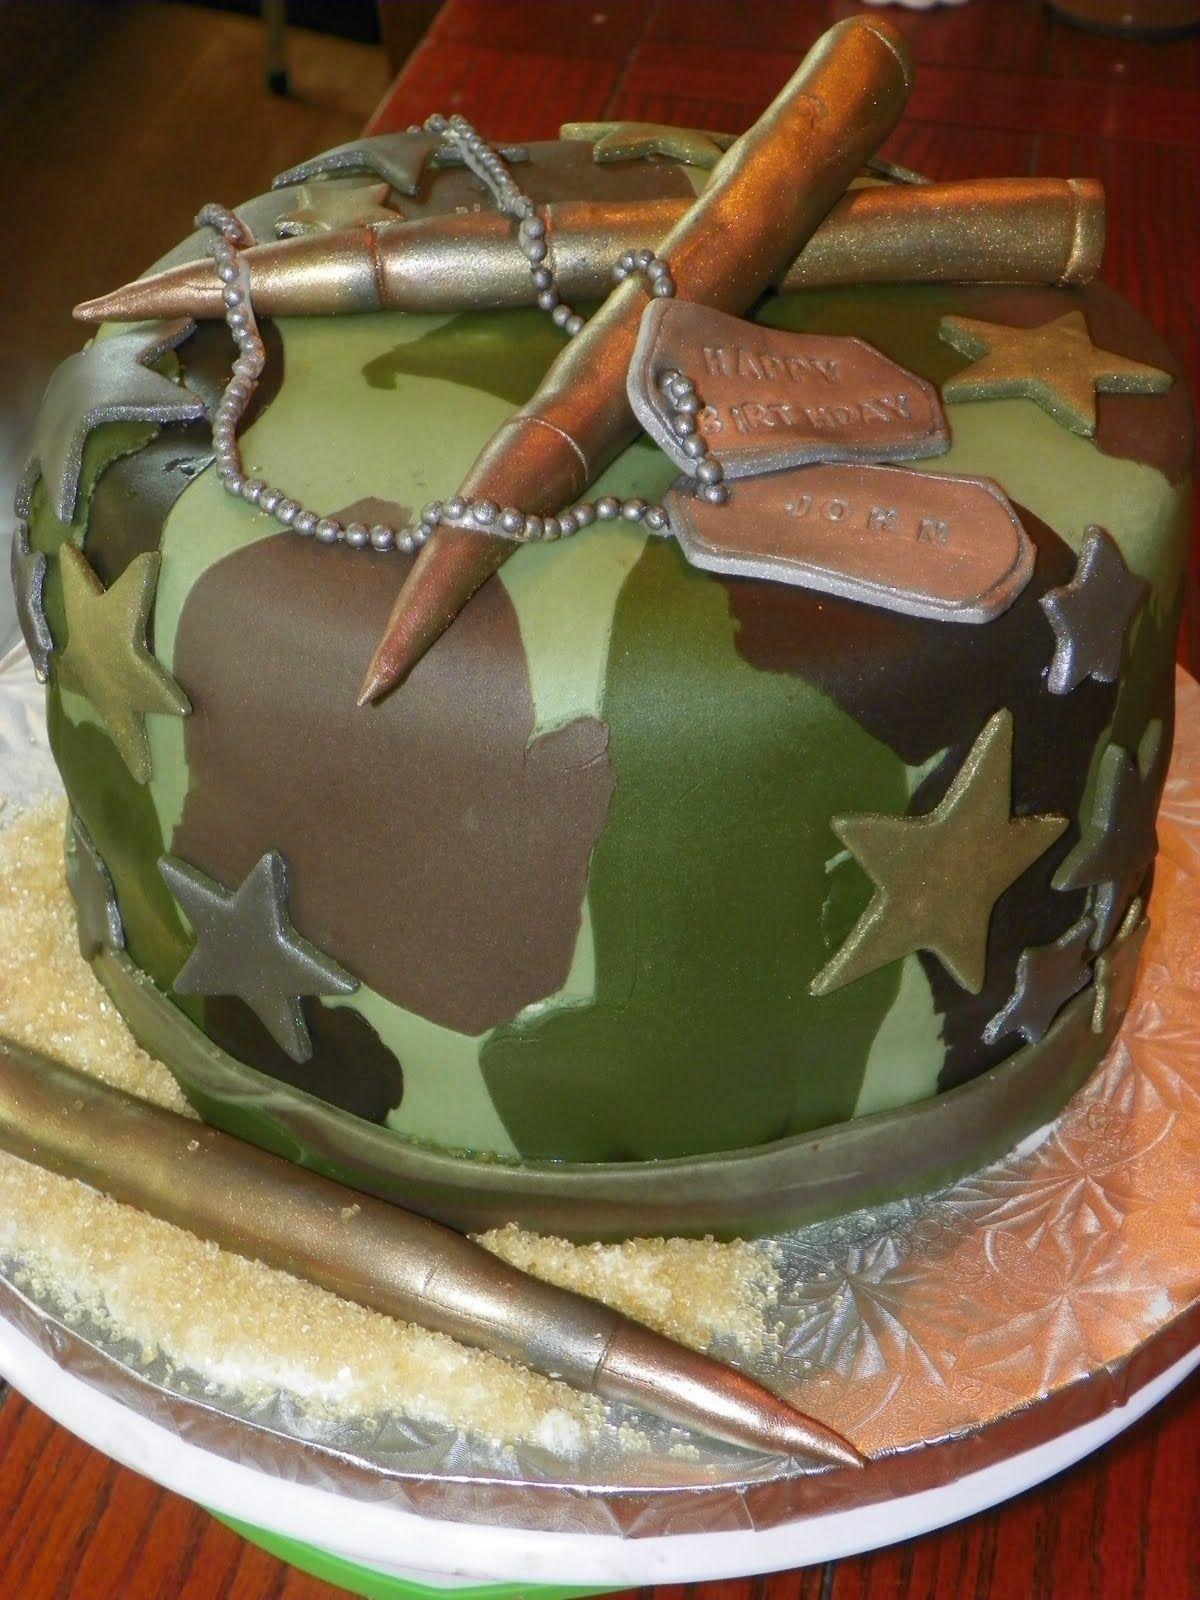 Marine Corps Wedding Cake Colorz Plumeria Cake Studio